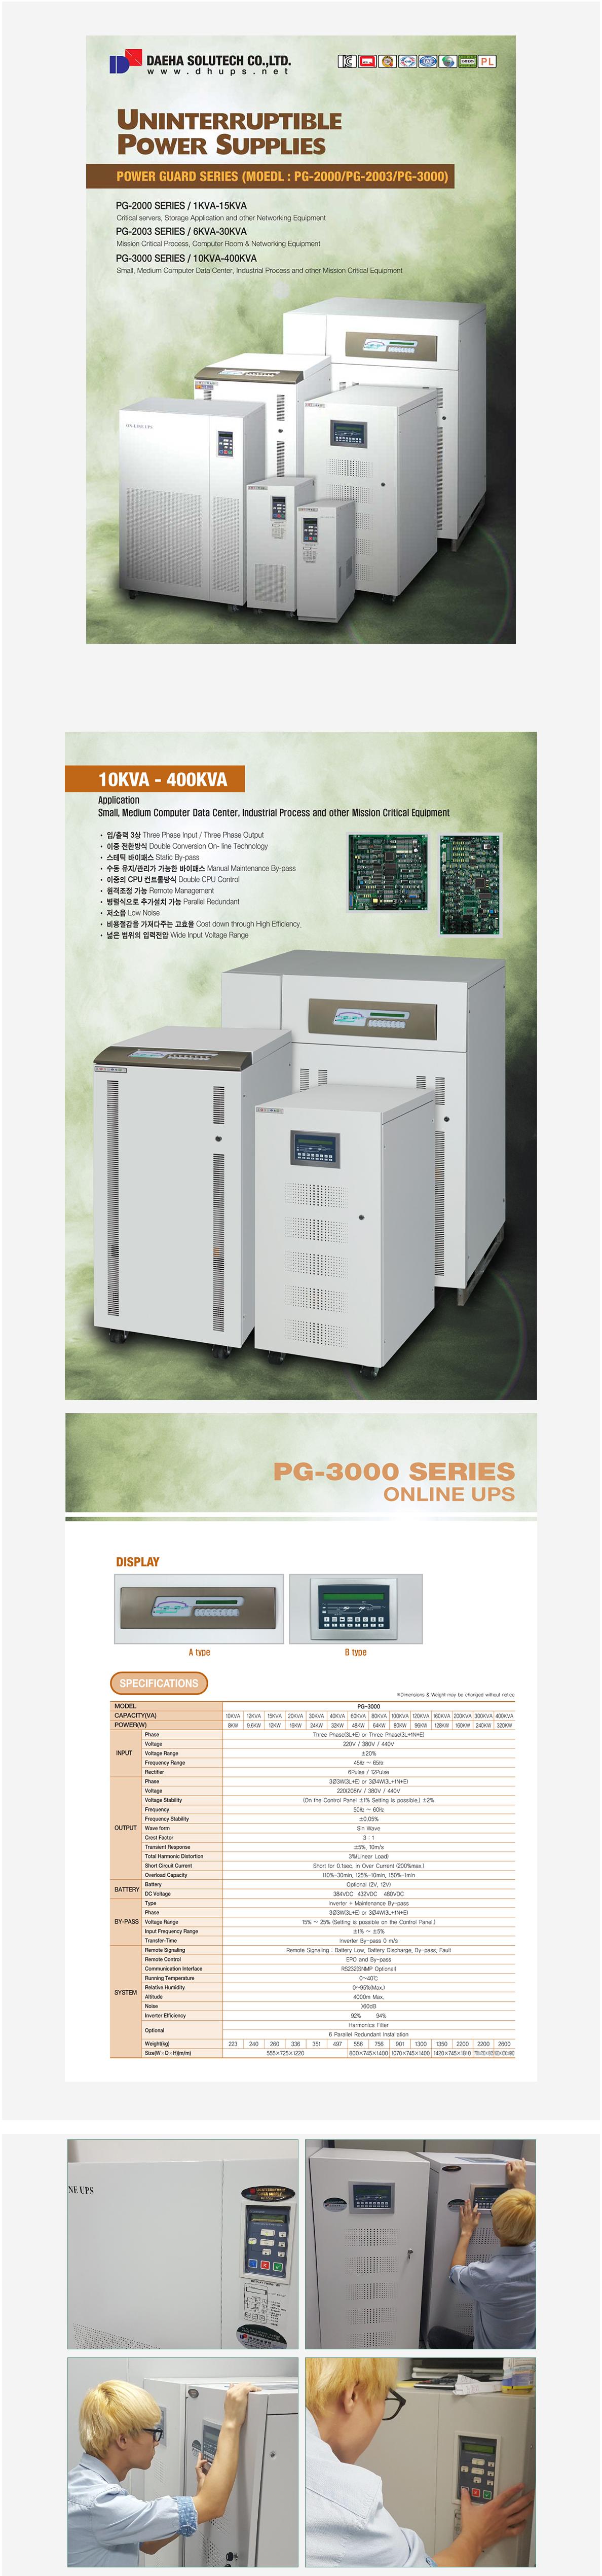 Daeha Solutech UPS (Uninterruptible Power Supply) PG-Series 2